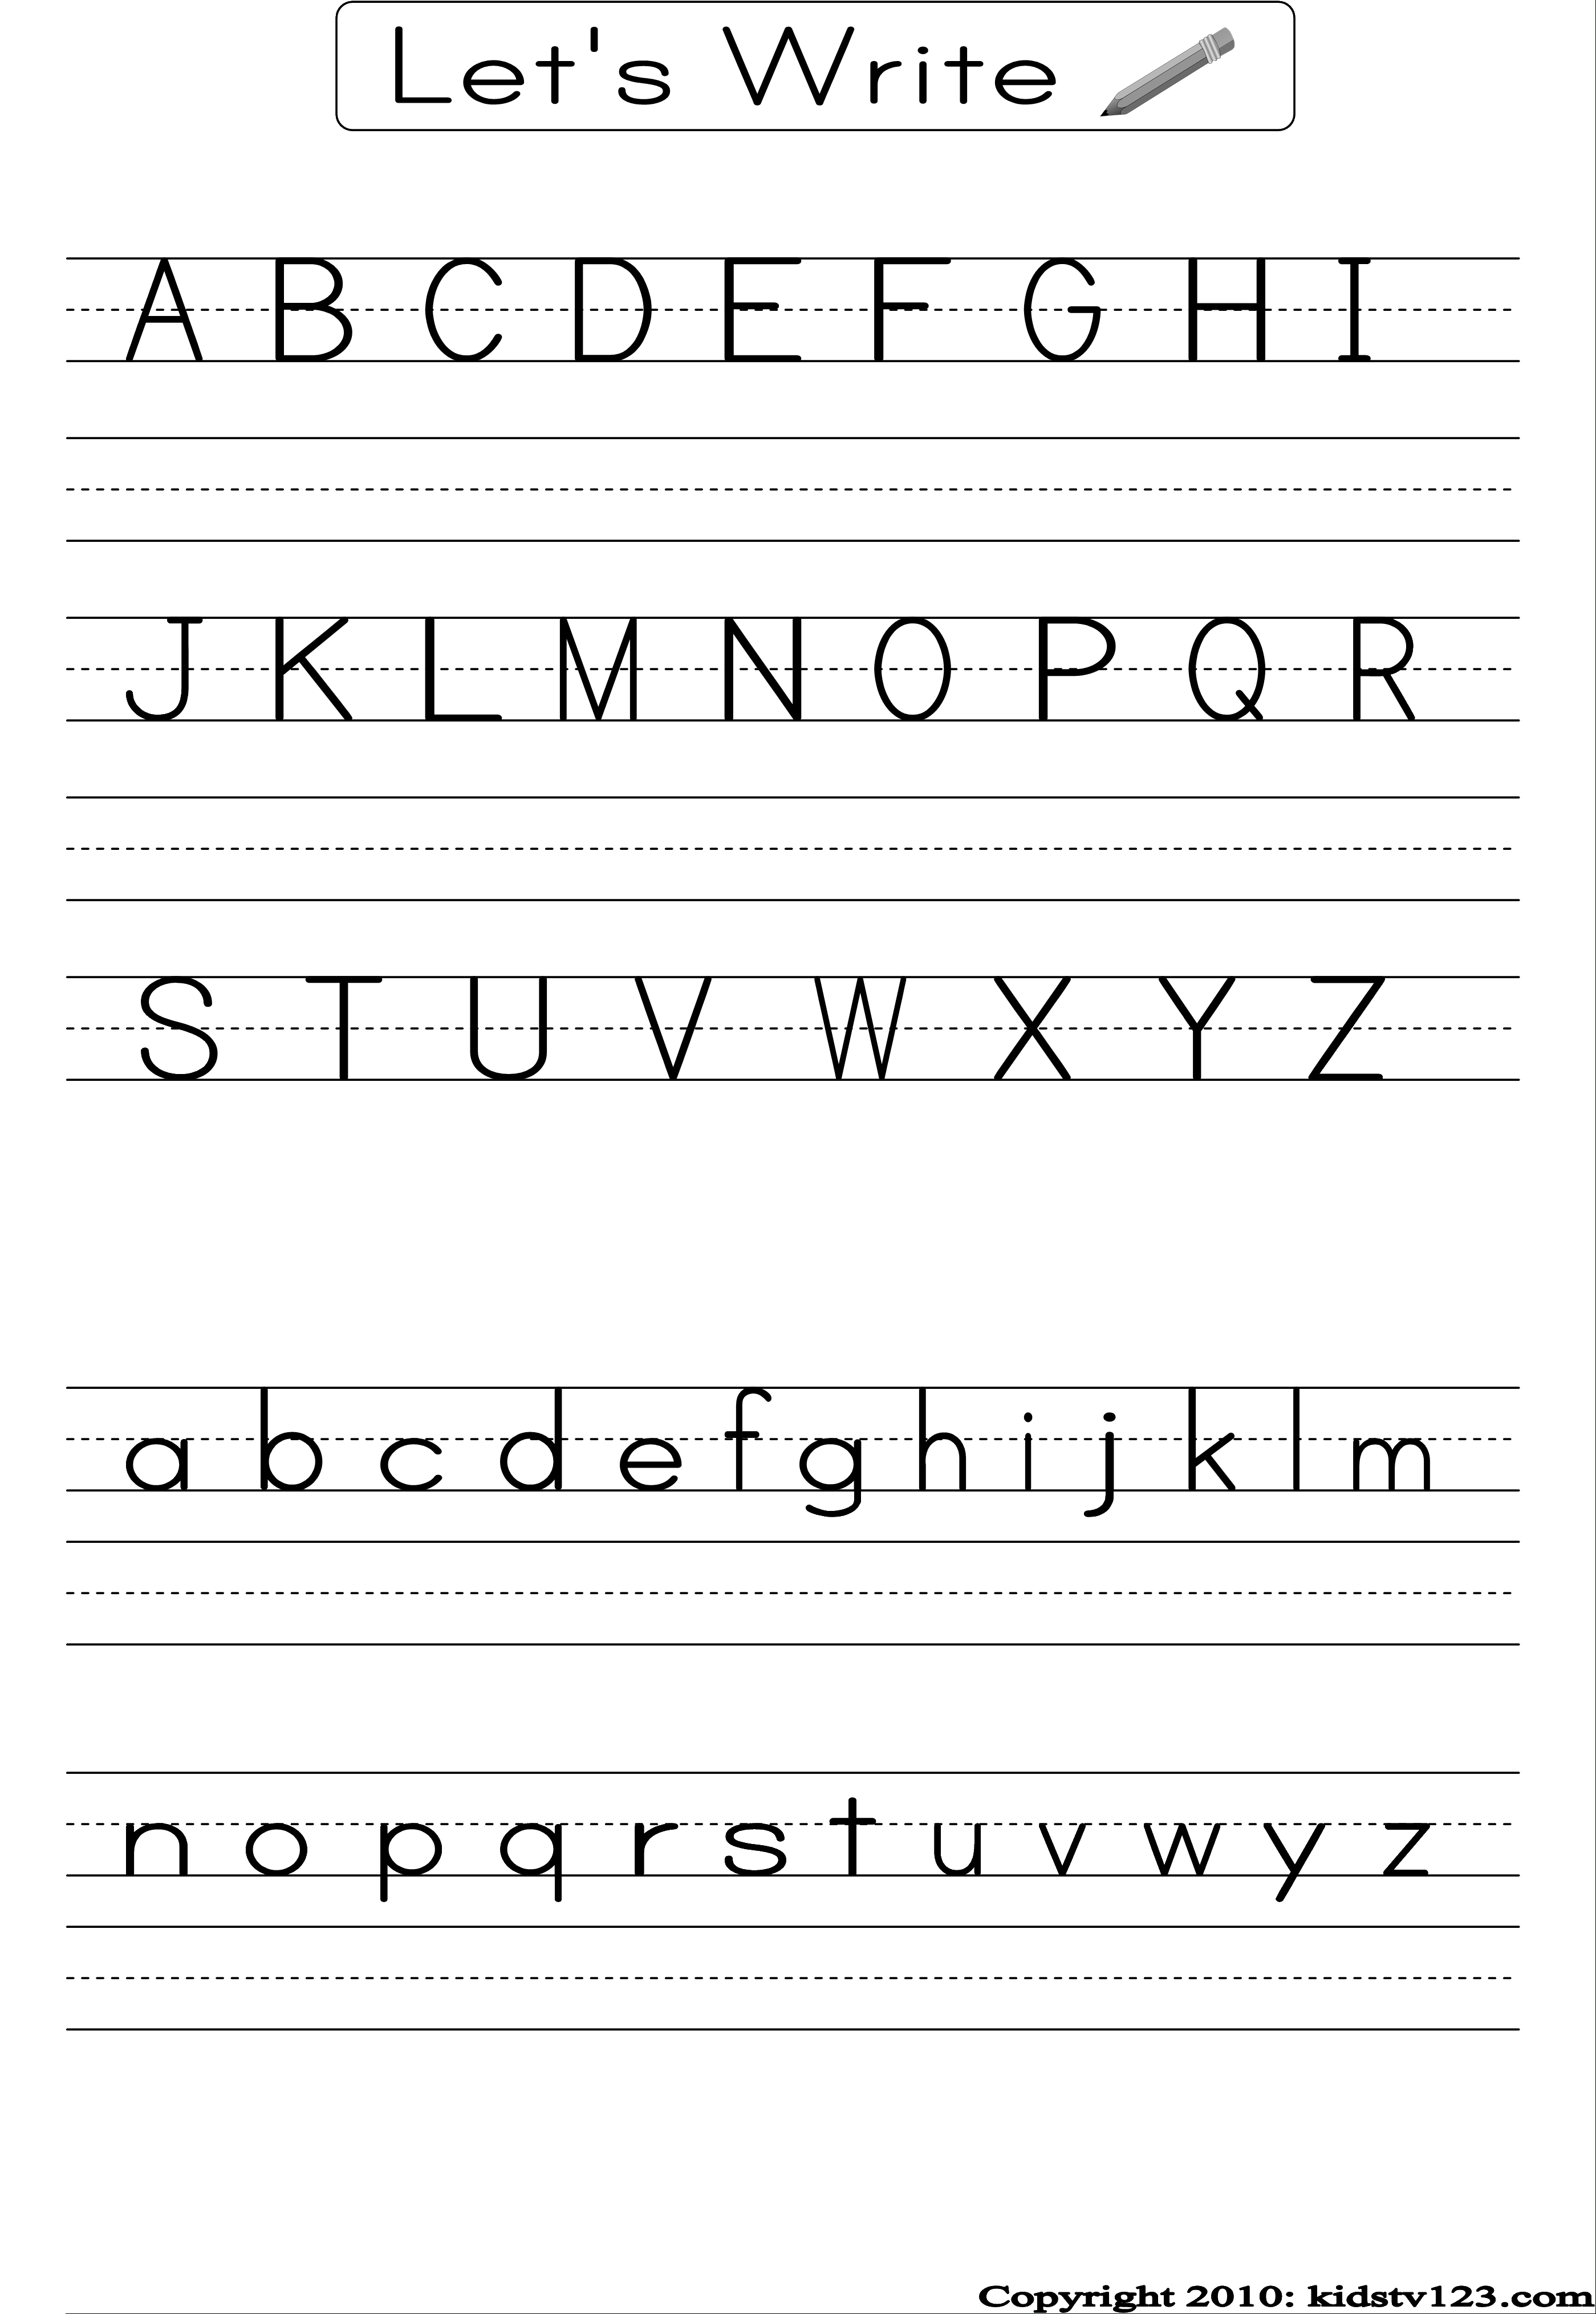 Alphabet Writing Practice Sheet | Edu-Fun | Alphabet Worksheets | Preschool Writing Worksheets Free Printable